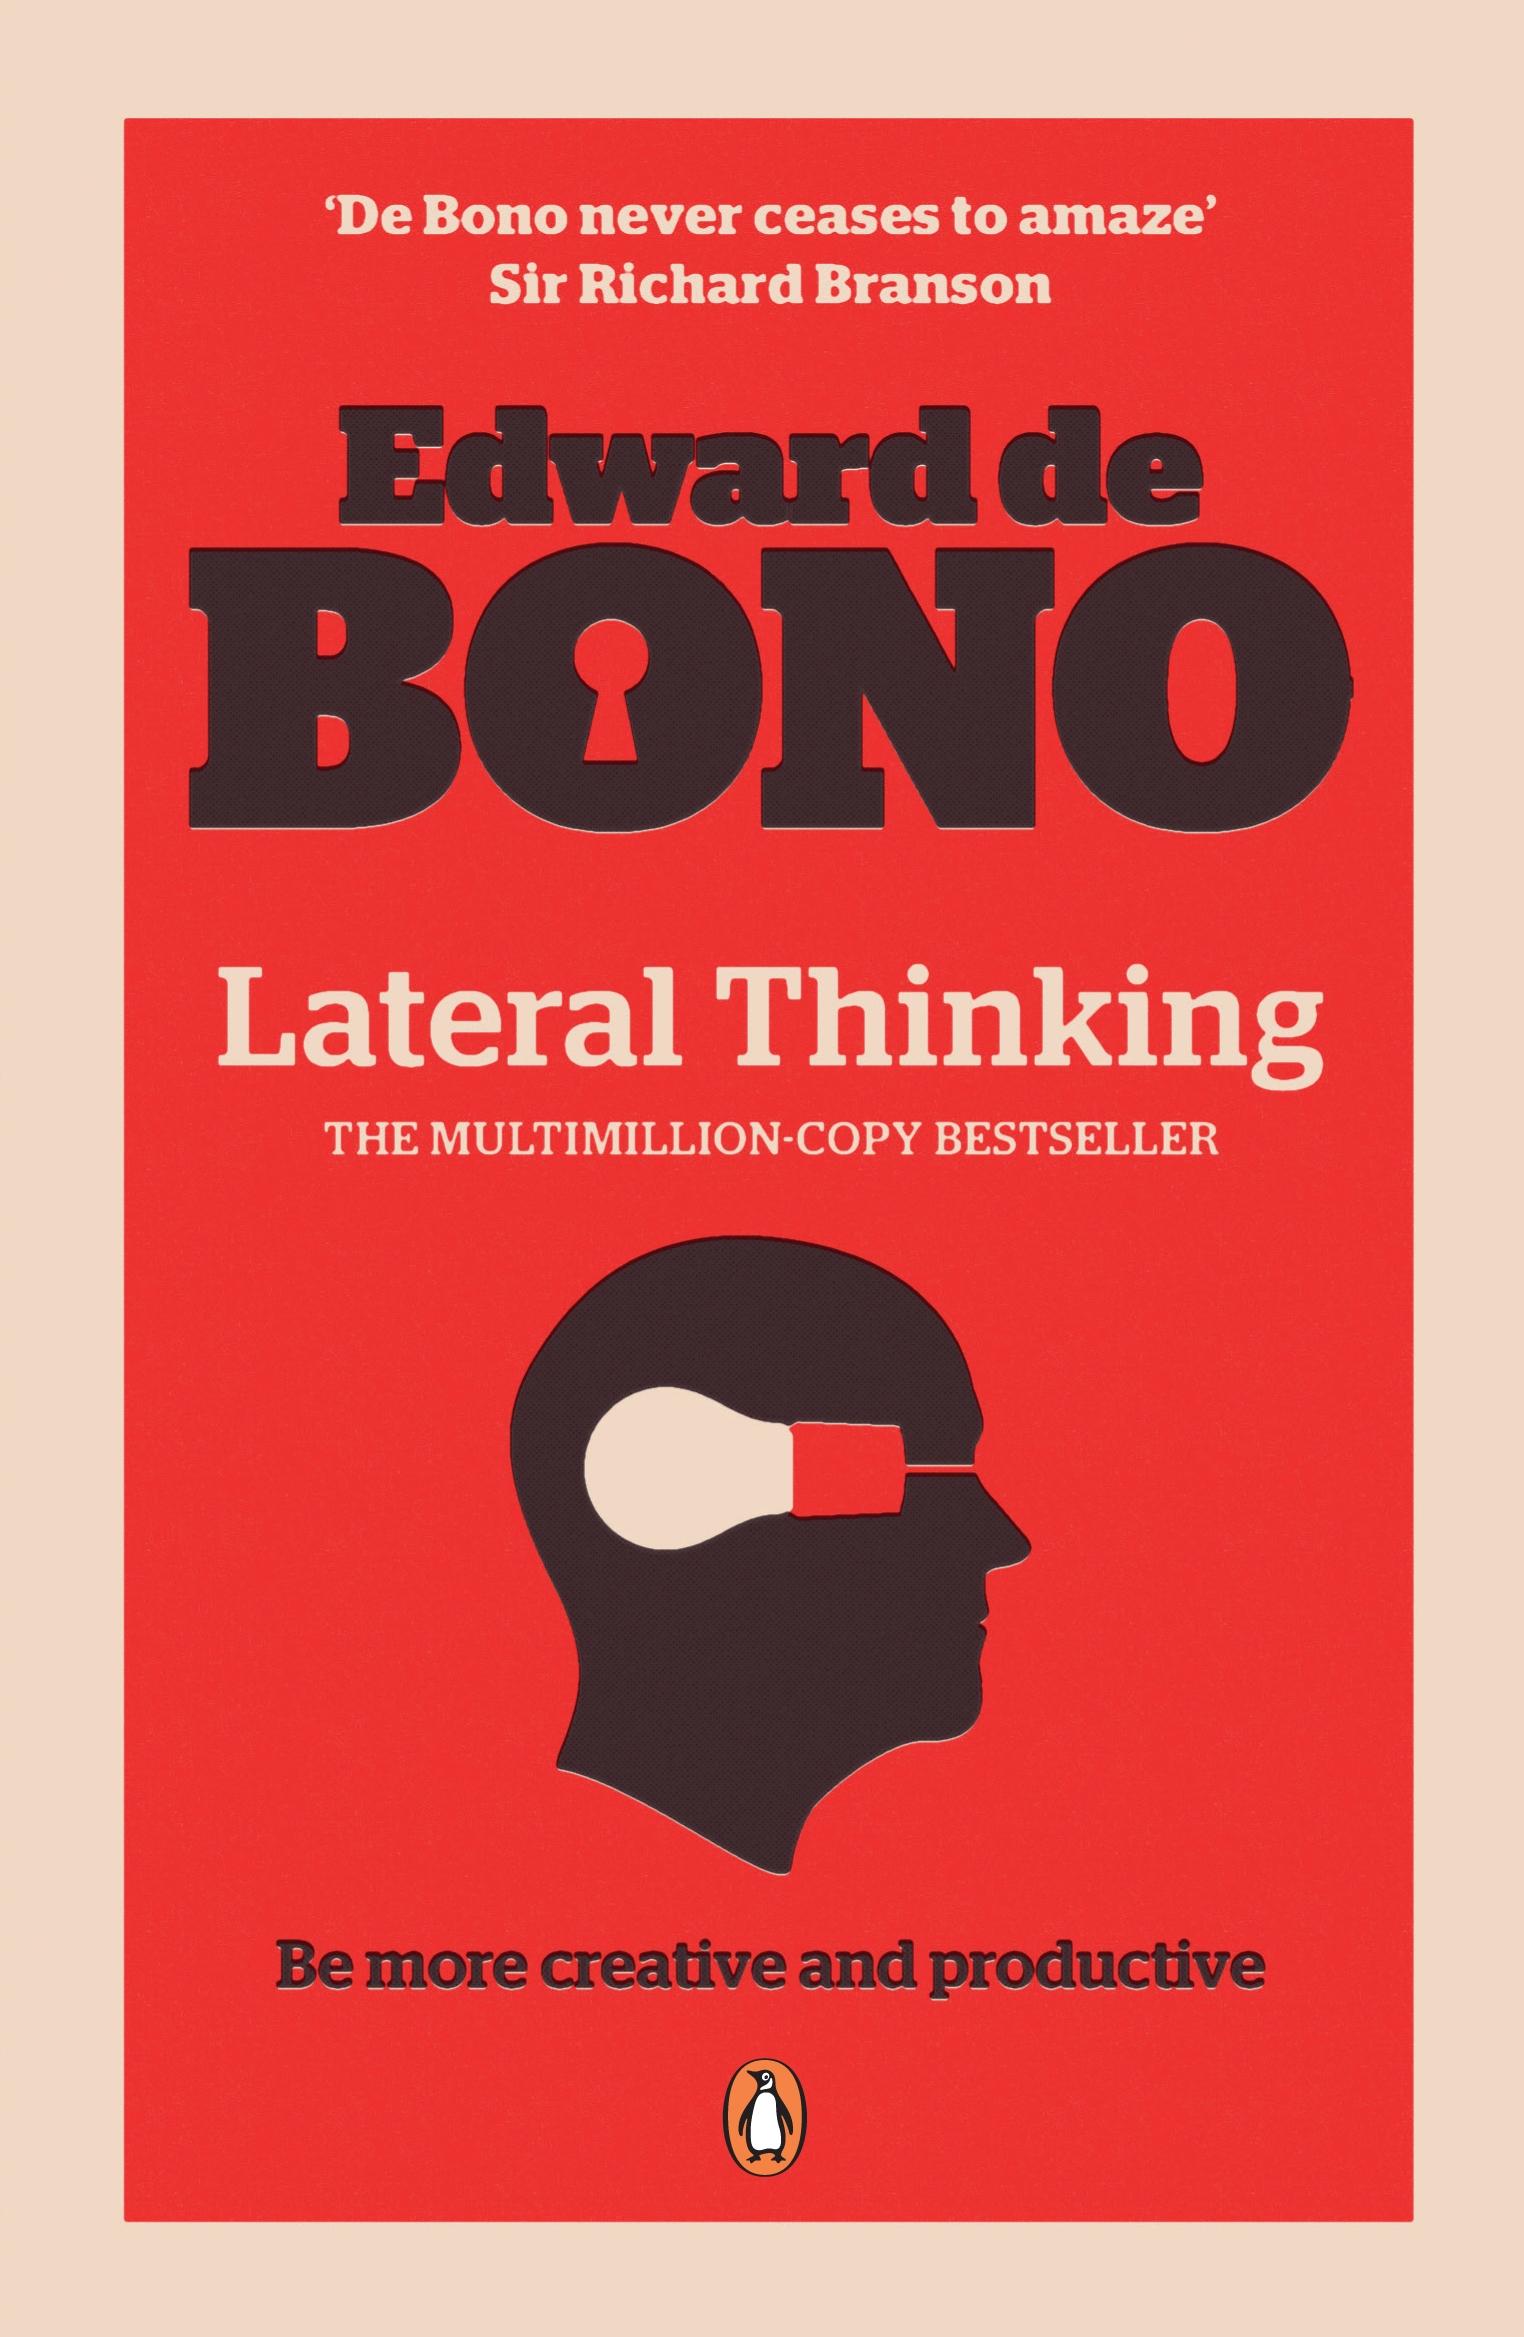 Download Ebook Lateral Thinking by Edward de Bono Pdf